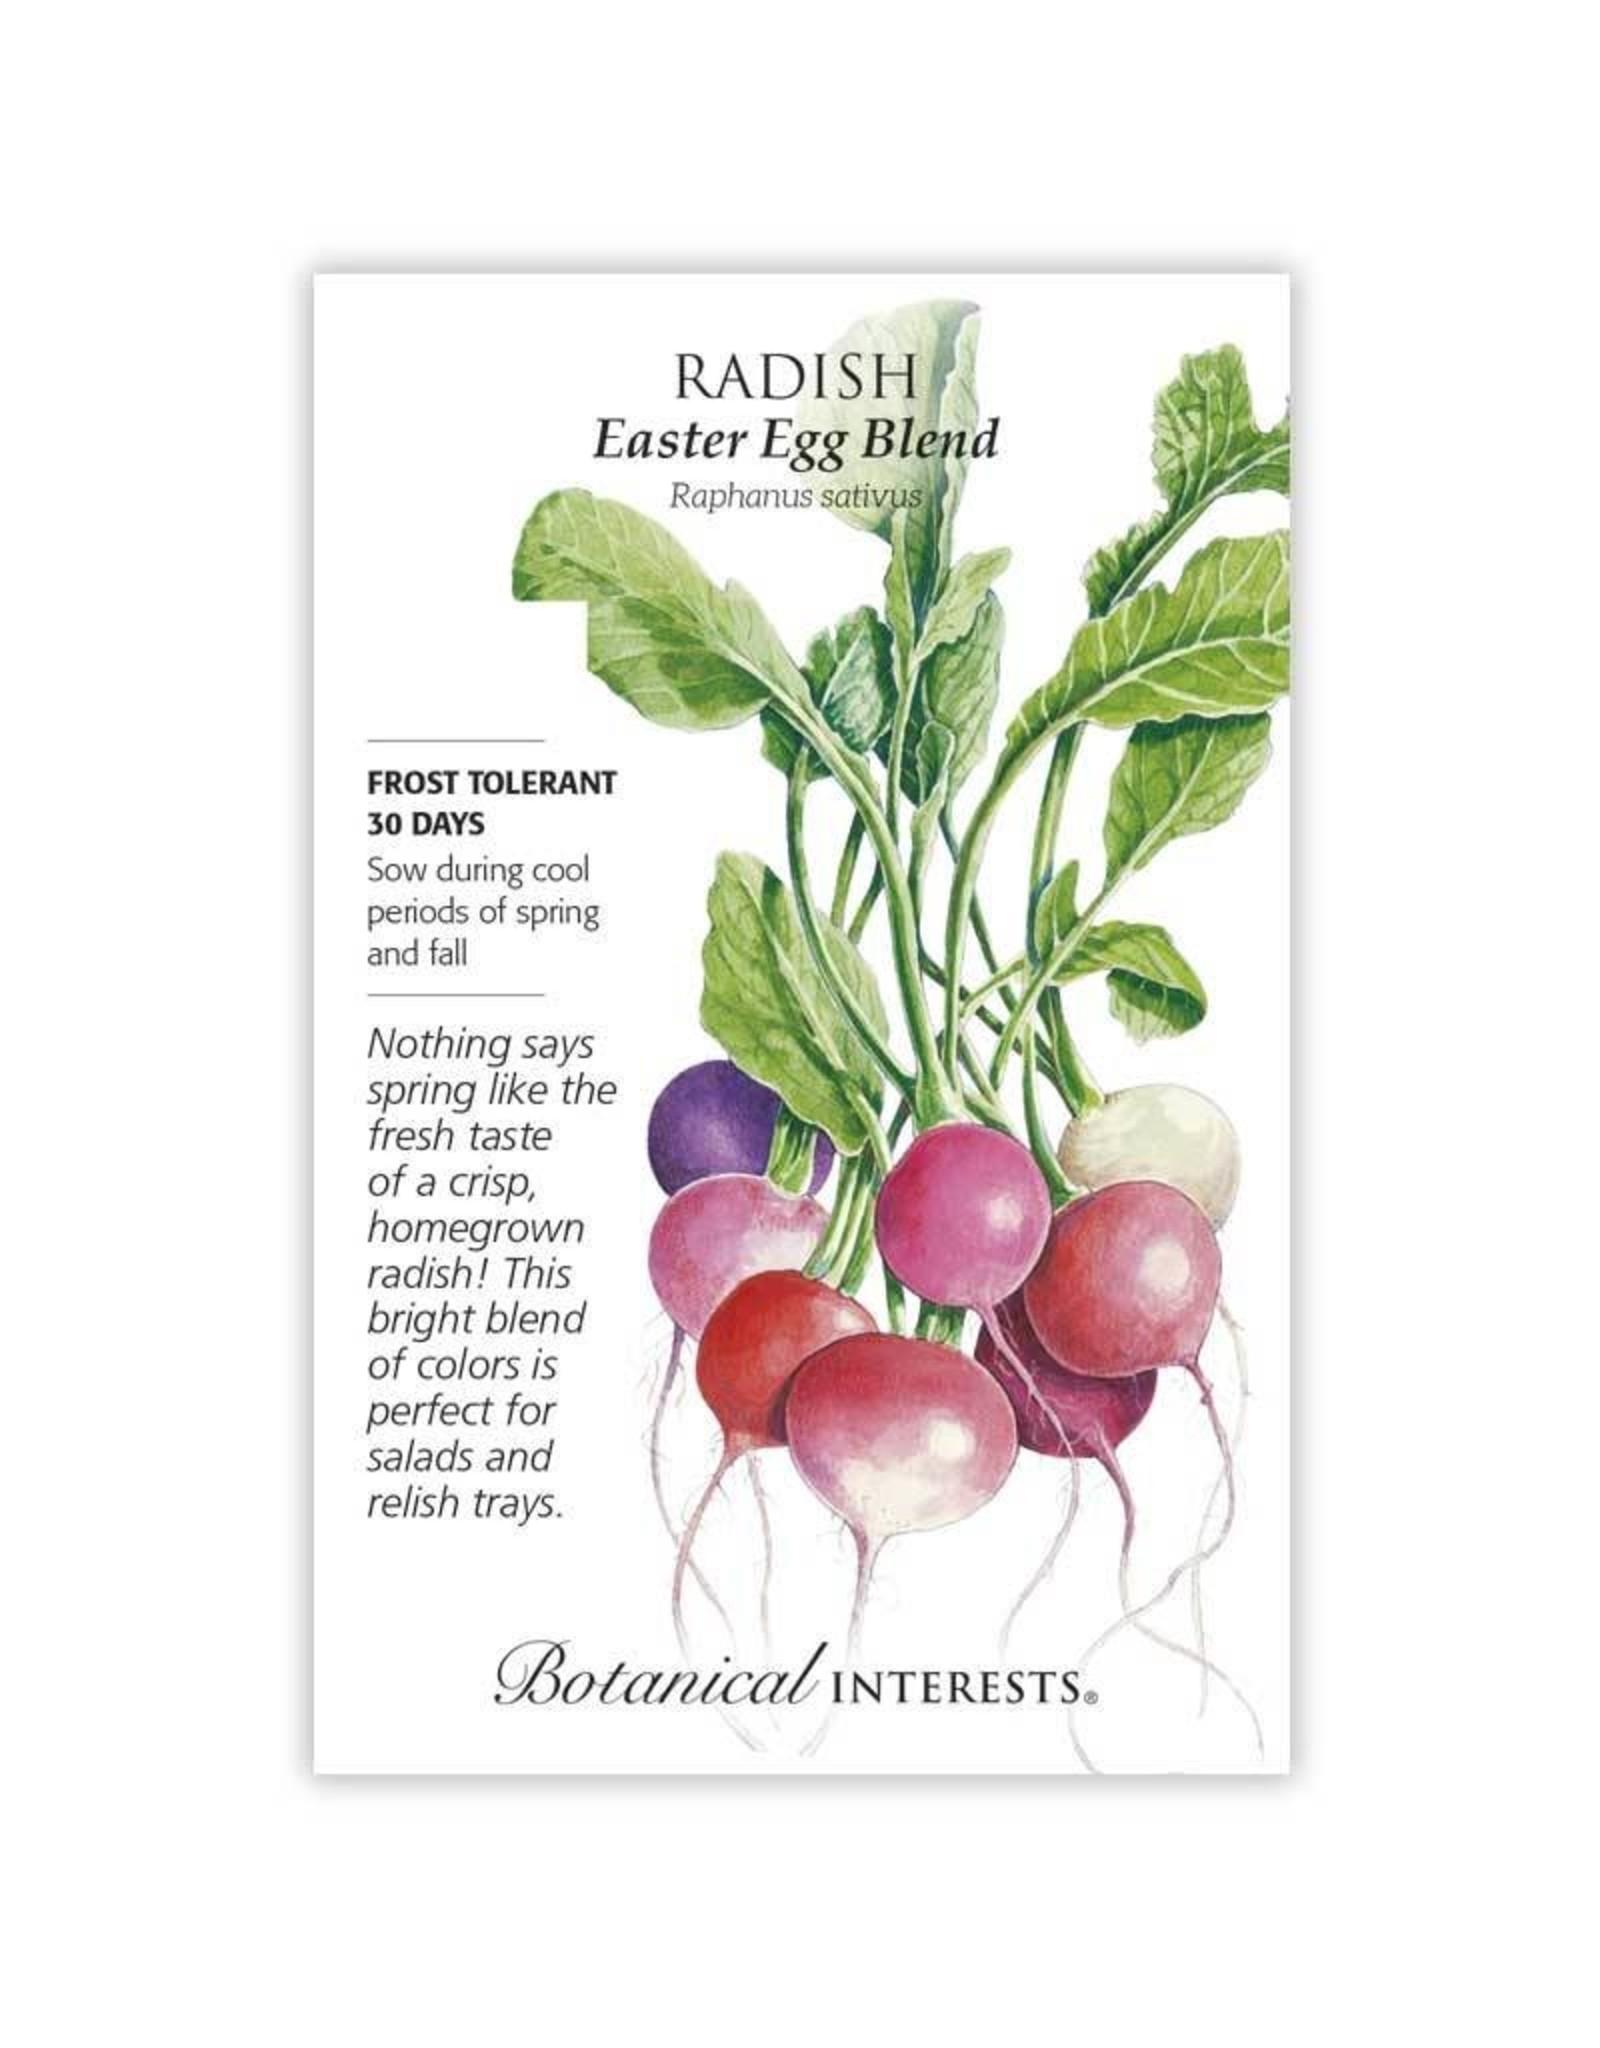 Seeds - Radish Easter Egg Blend